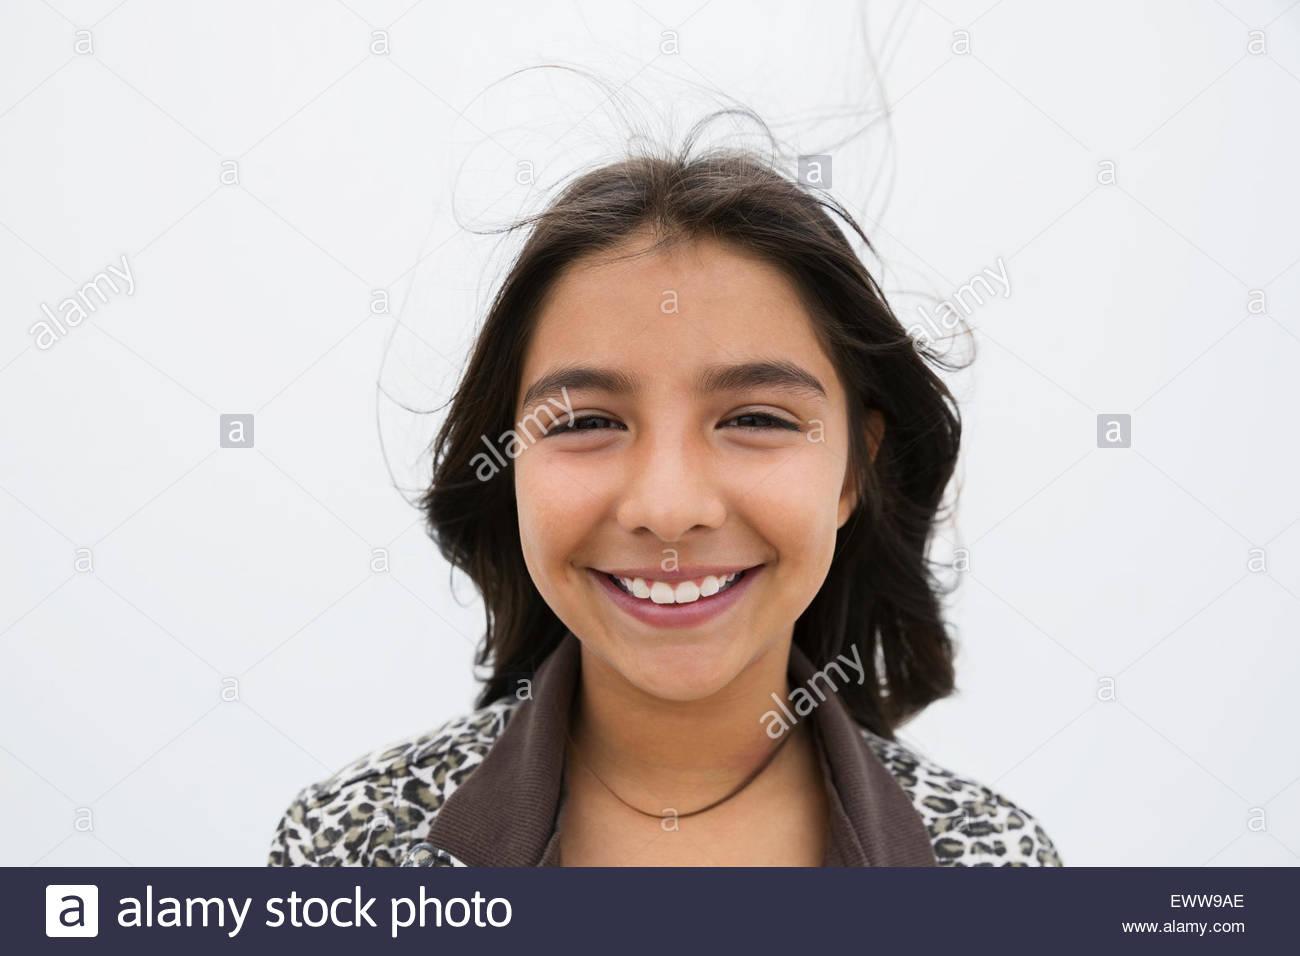 Lächelnde Brünette Mädchen Porträt Stockbild